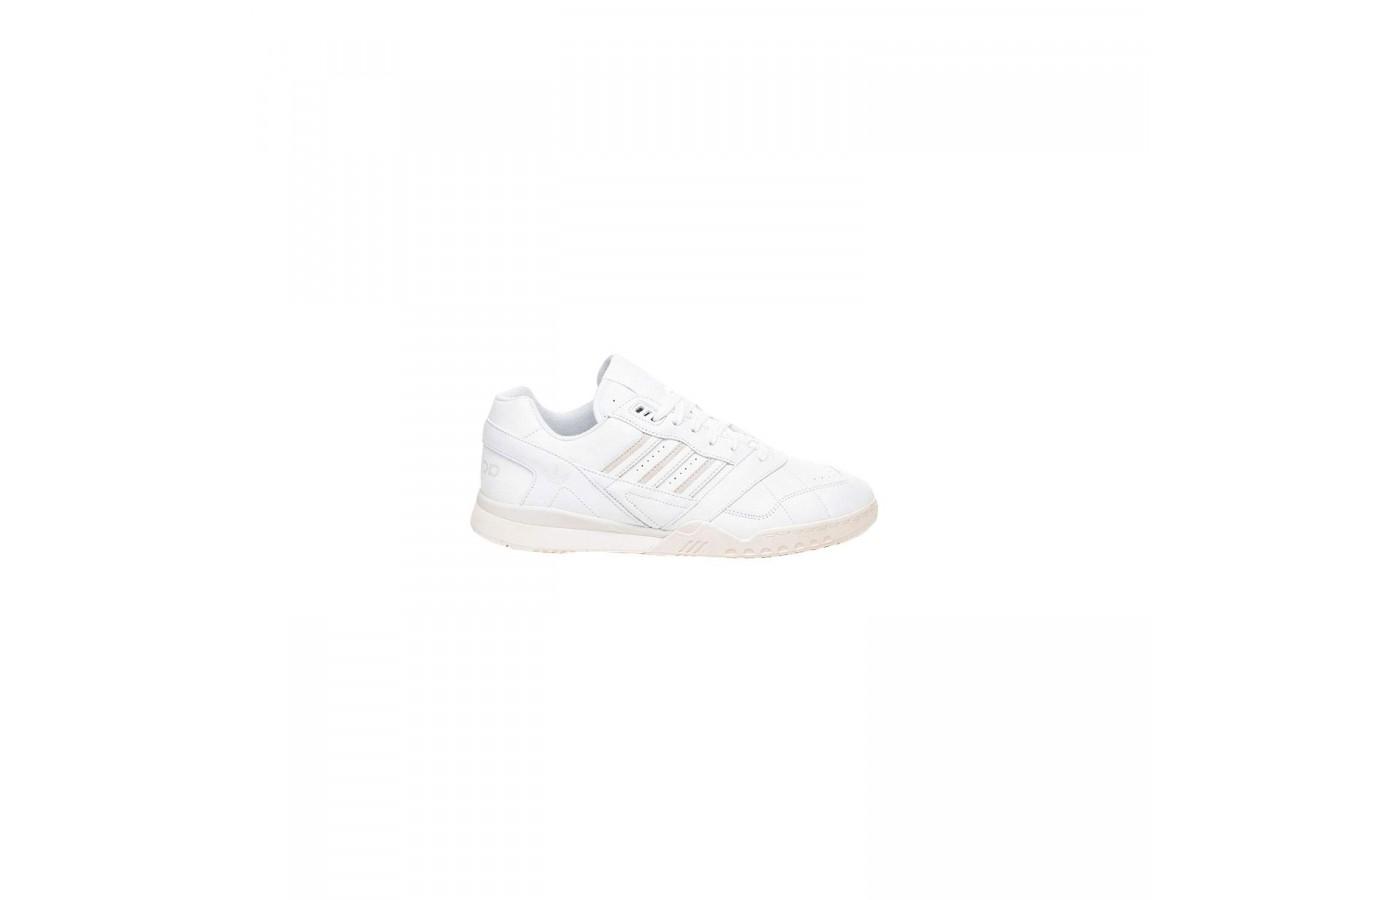 Adidas A.R Angled